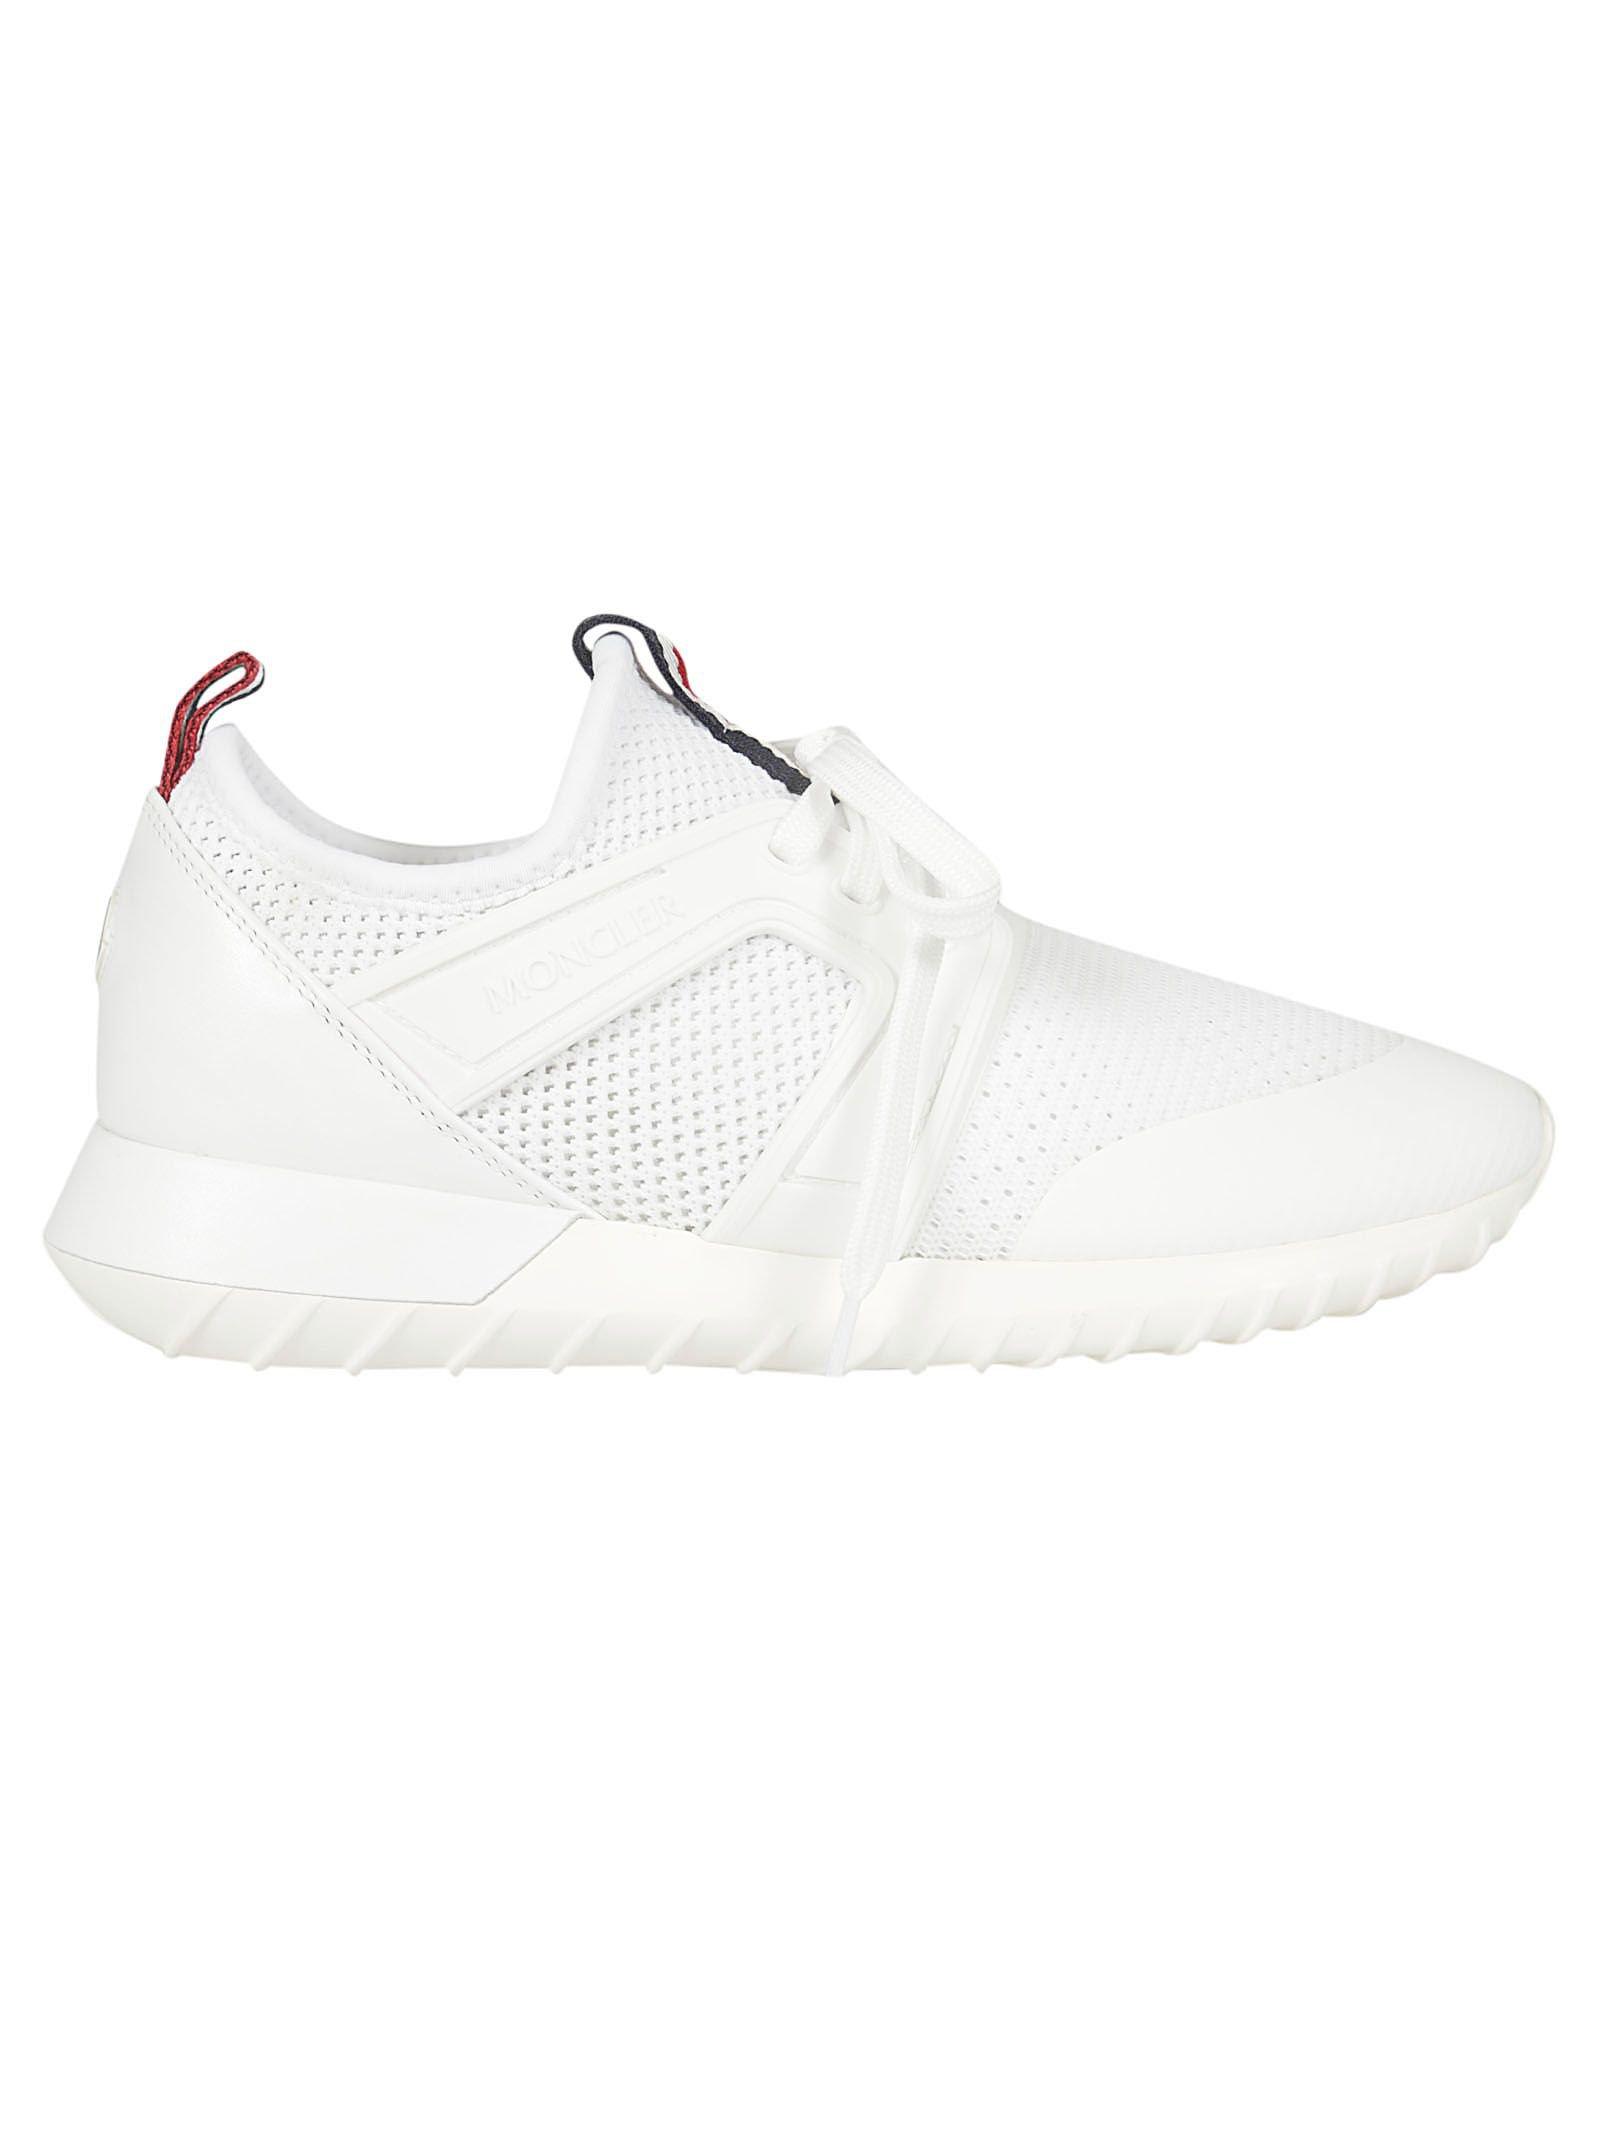 Moncler Mesh Sneakers